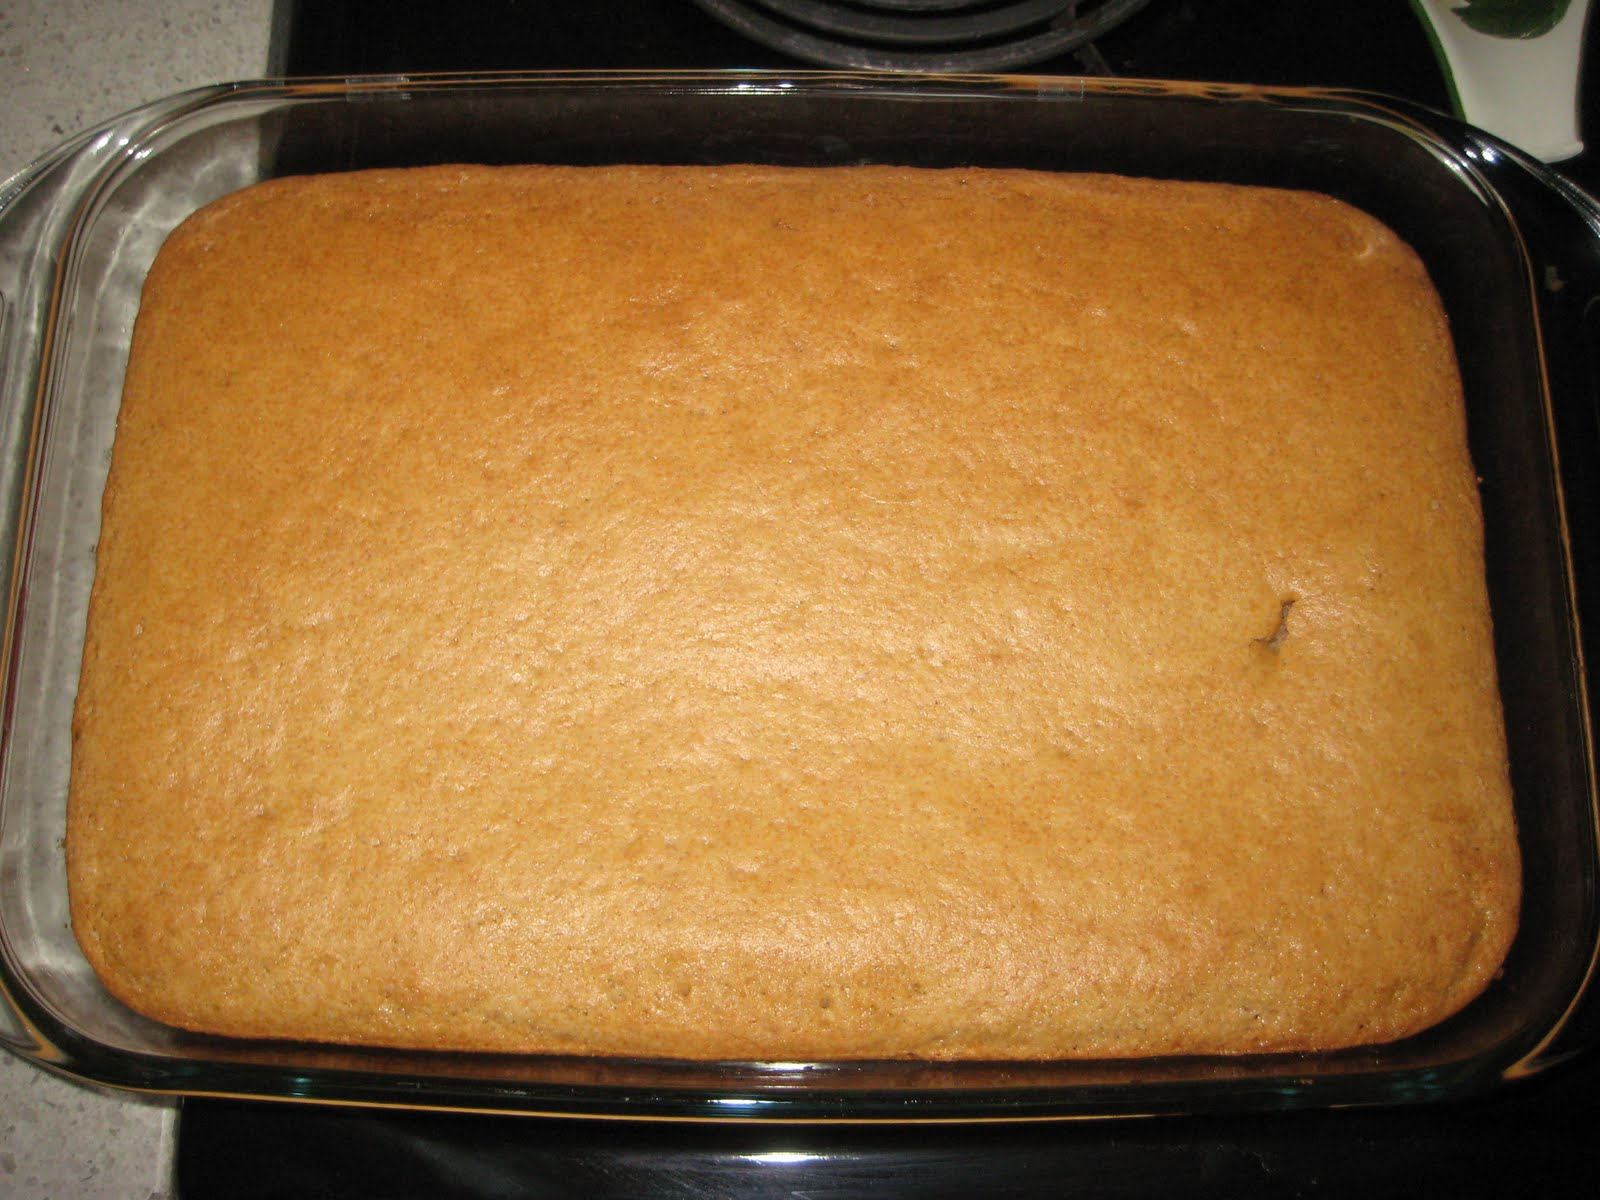 Vanilla Cake Recipe Low Calories: Eggless Condensed Milk Vanilla Cake (Low Fat & 115